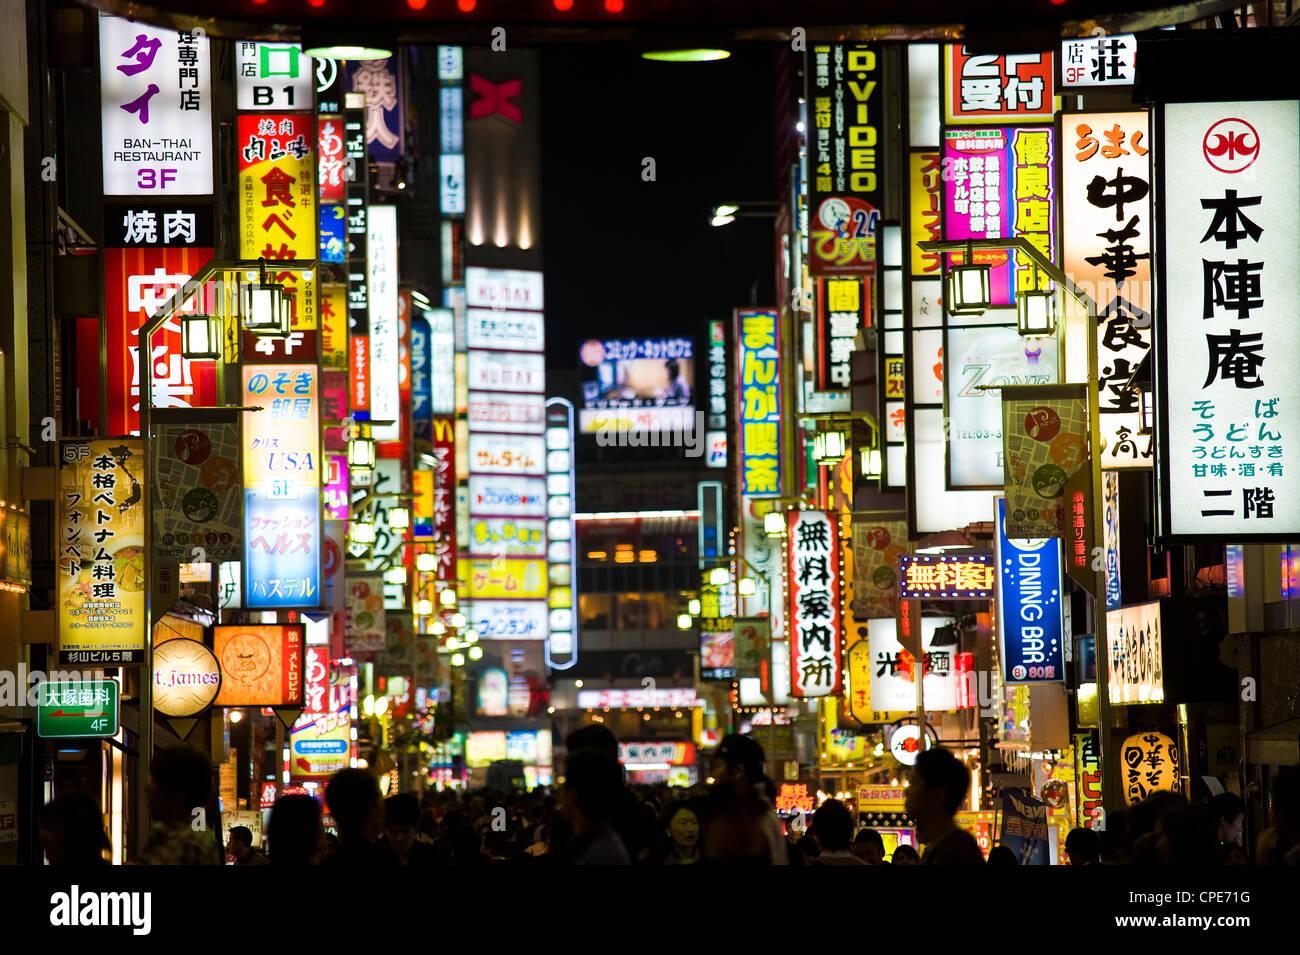 Las señales de neón, Kabukicho, Shinjuku, Tokio, Japón, Asia Imagen De Stock